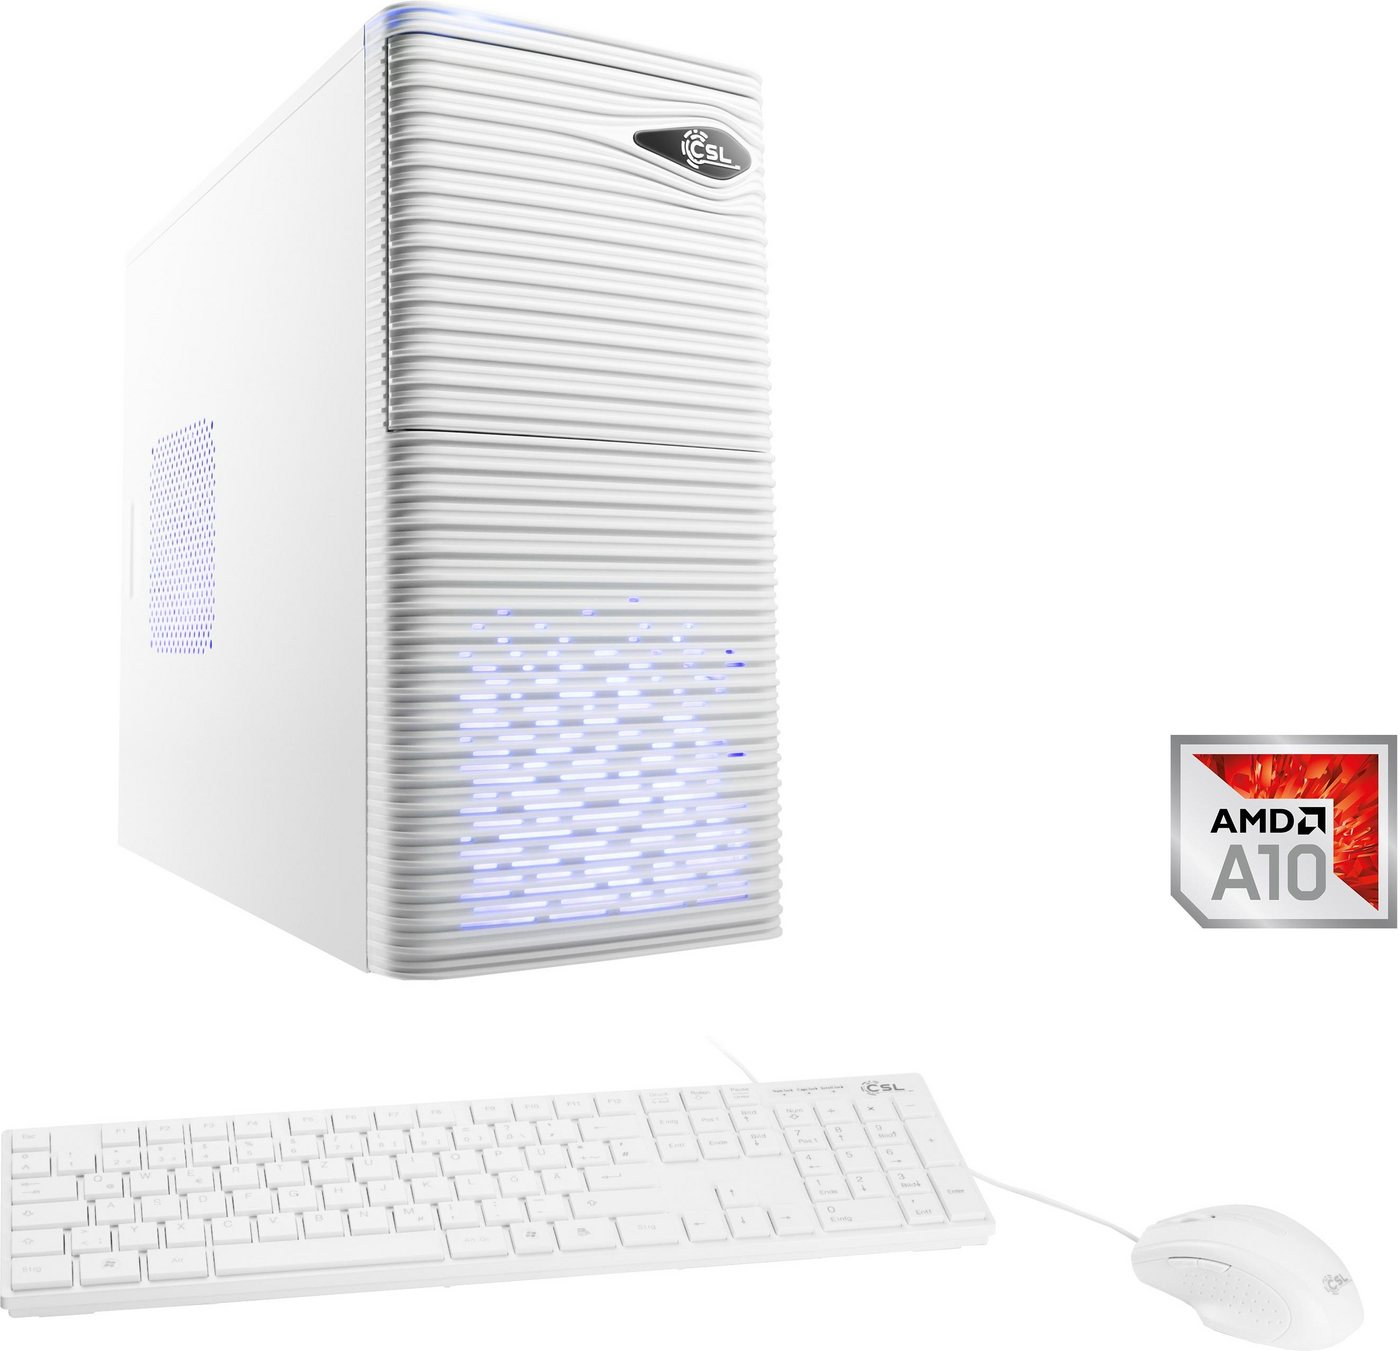 CSL Sprint T6815 PC (AMD A10, Radeon R7, 8 GB RAM, 1000 GB HDD, Radeon R7)